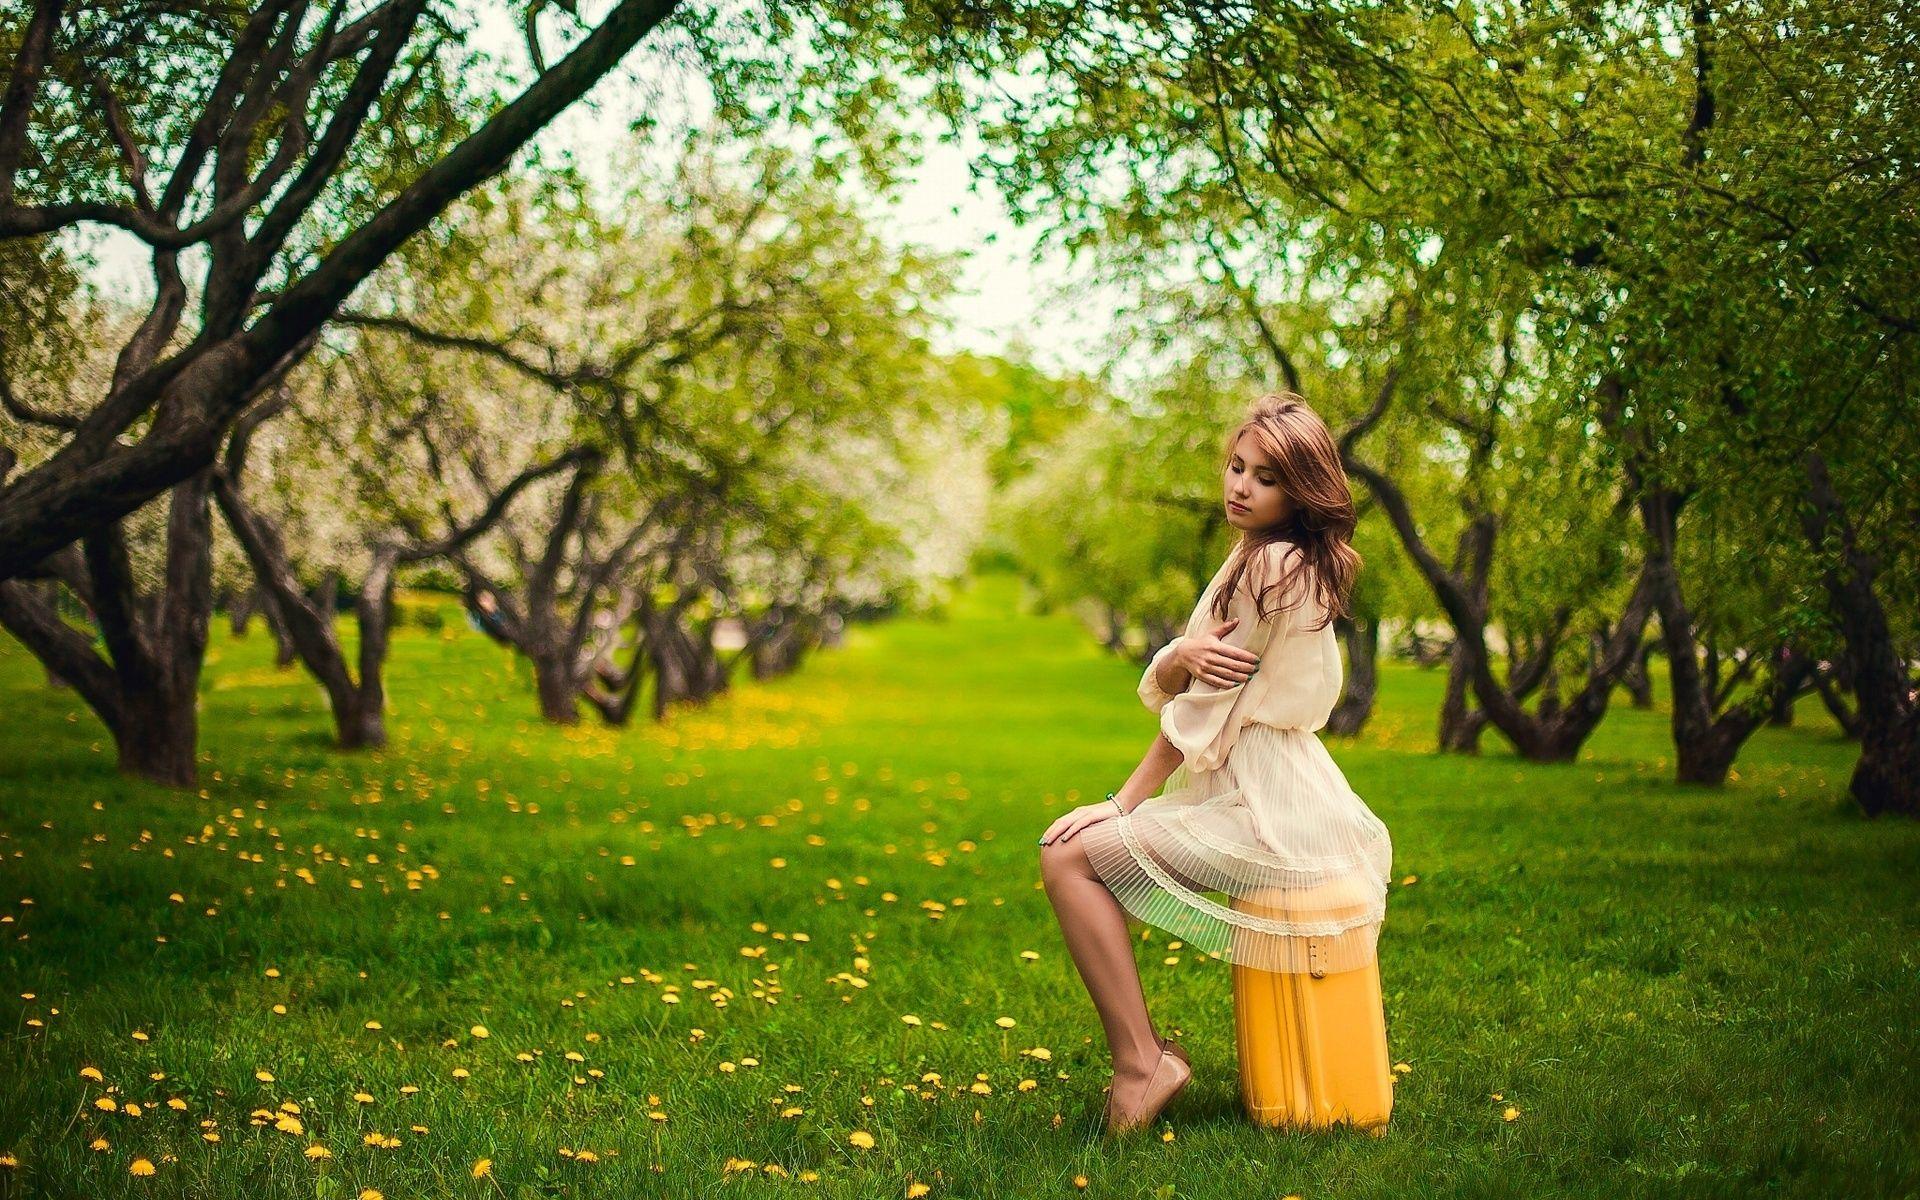 Girl Mood Garden Bag Dandelions